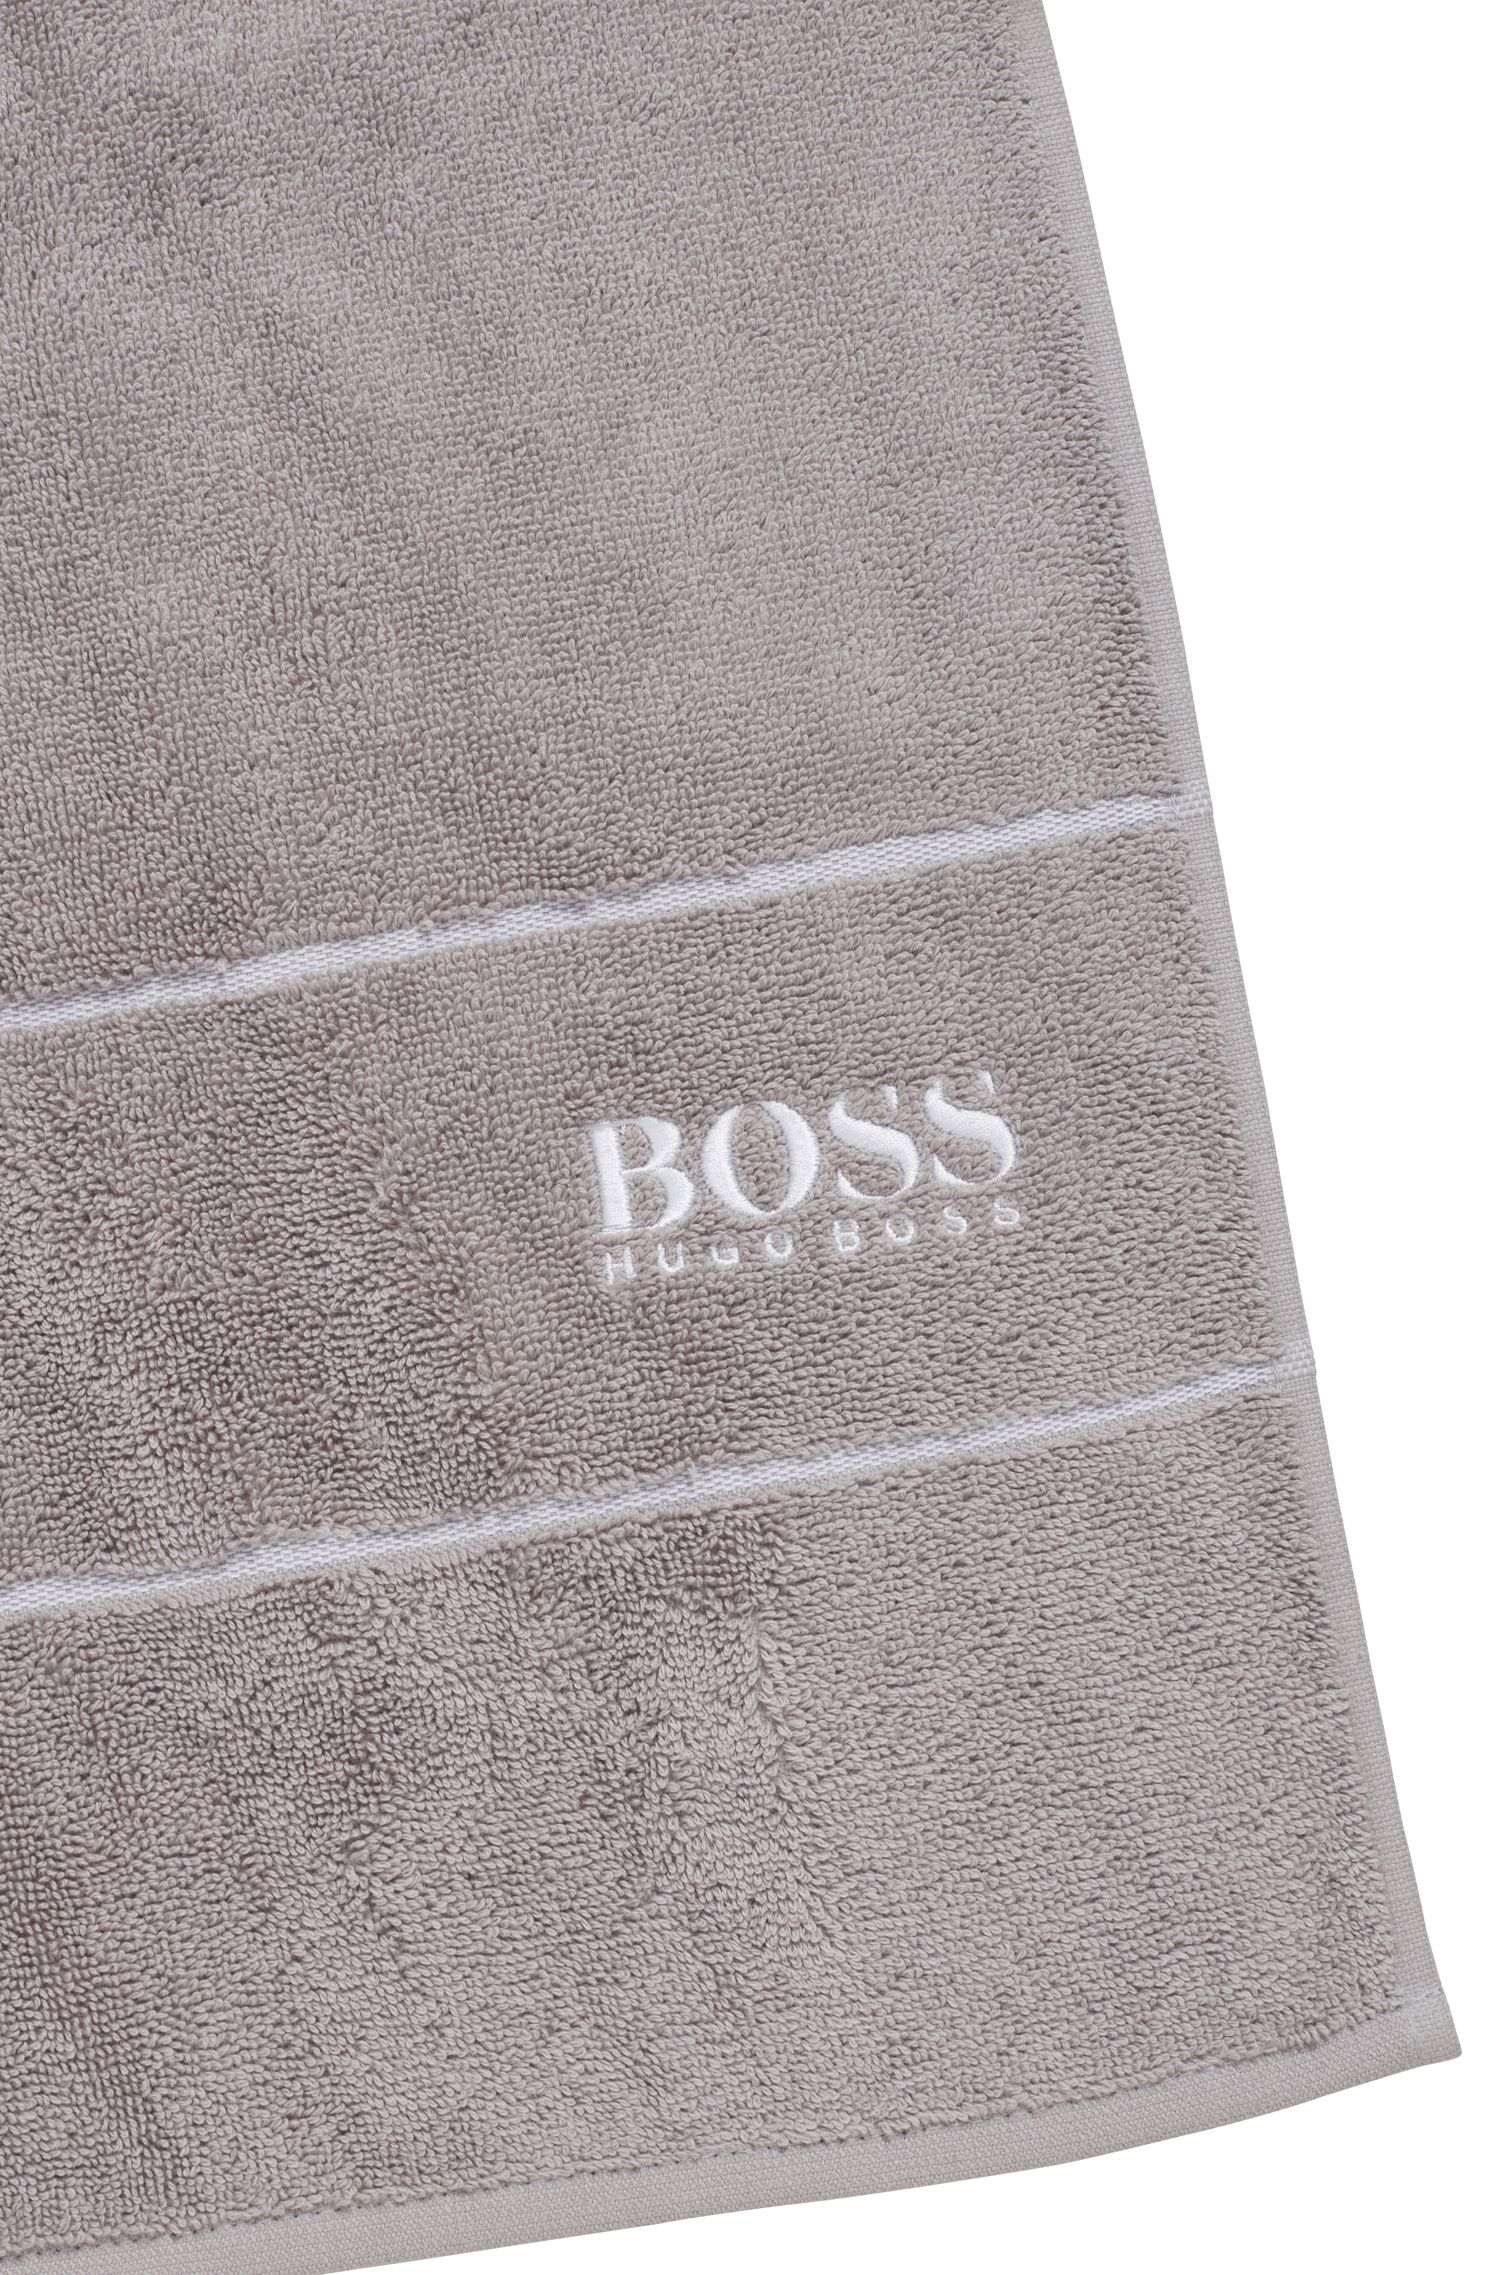 Finest Egyptian cotton bath towel with logo border, Dark Grey